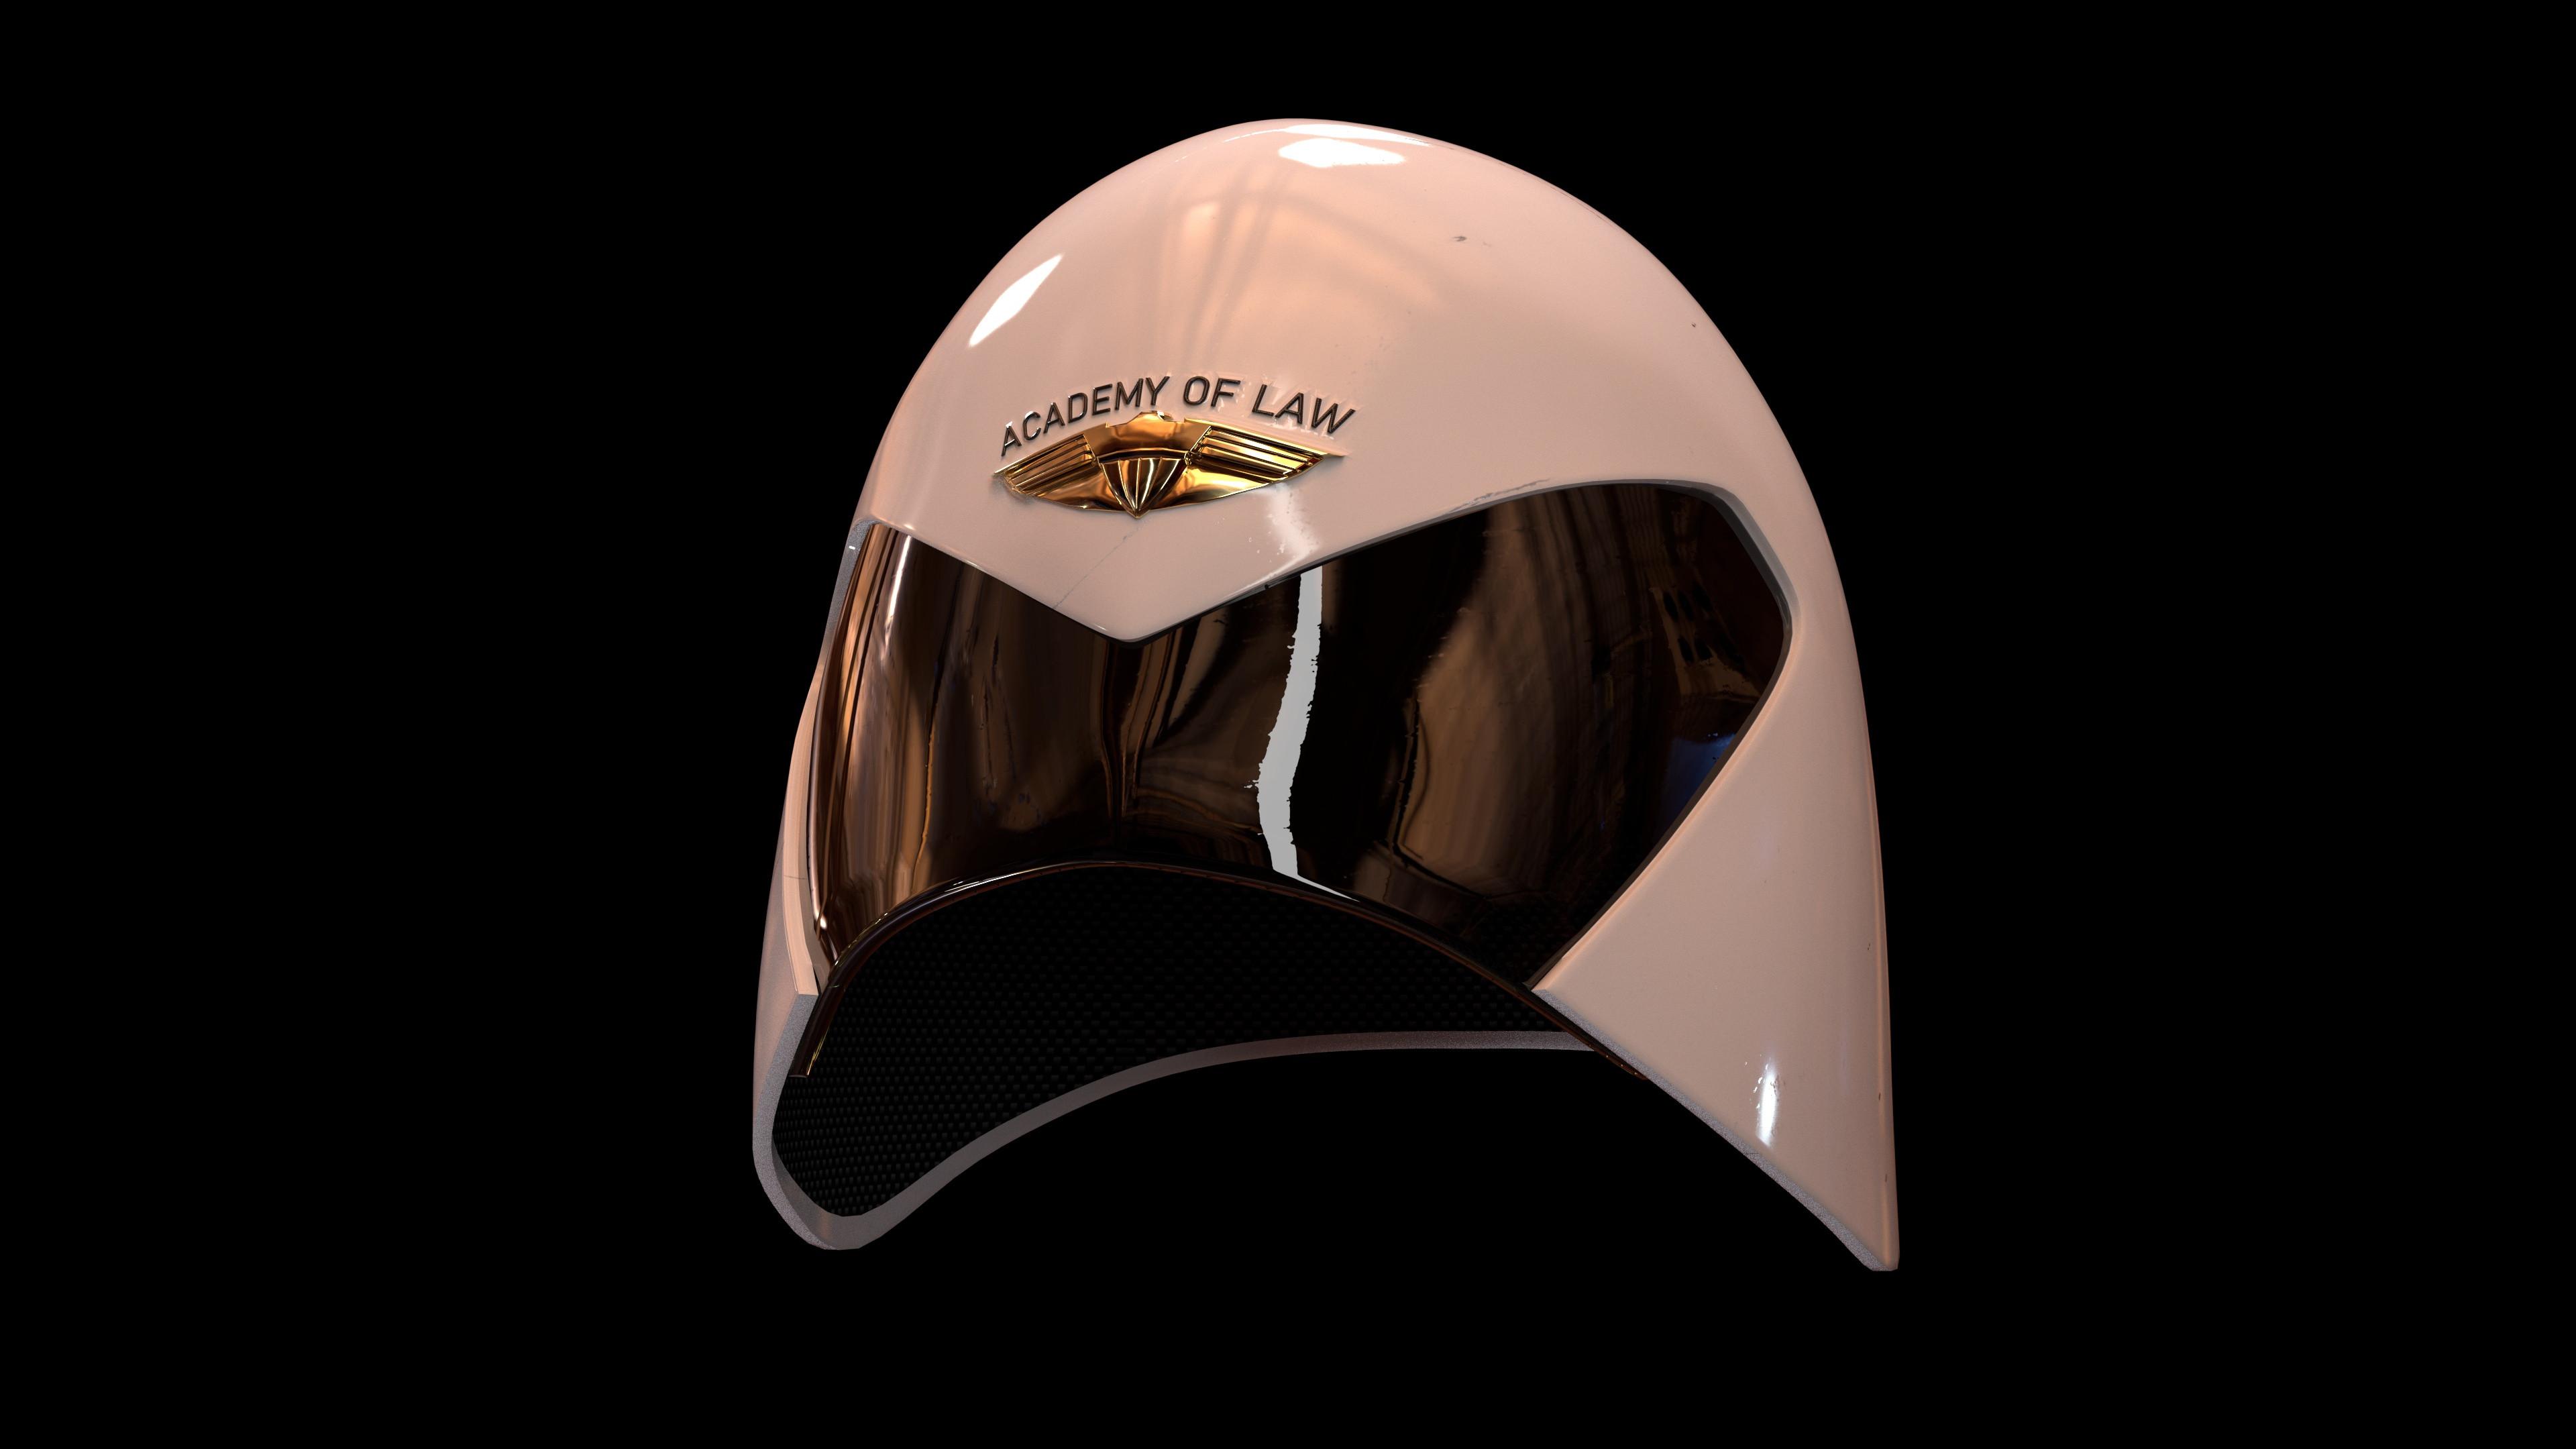 Mega-City One Cadet Helmet based on a design by Carlos Ezquerra